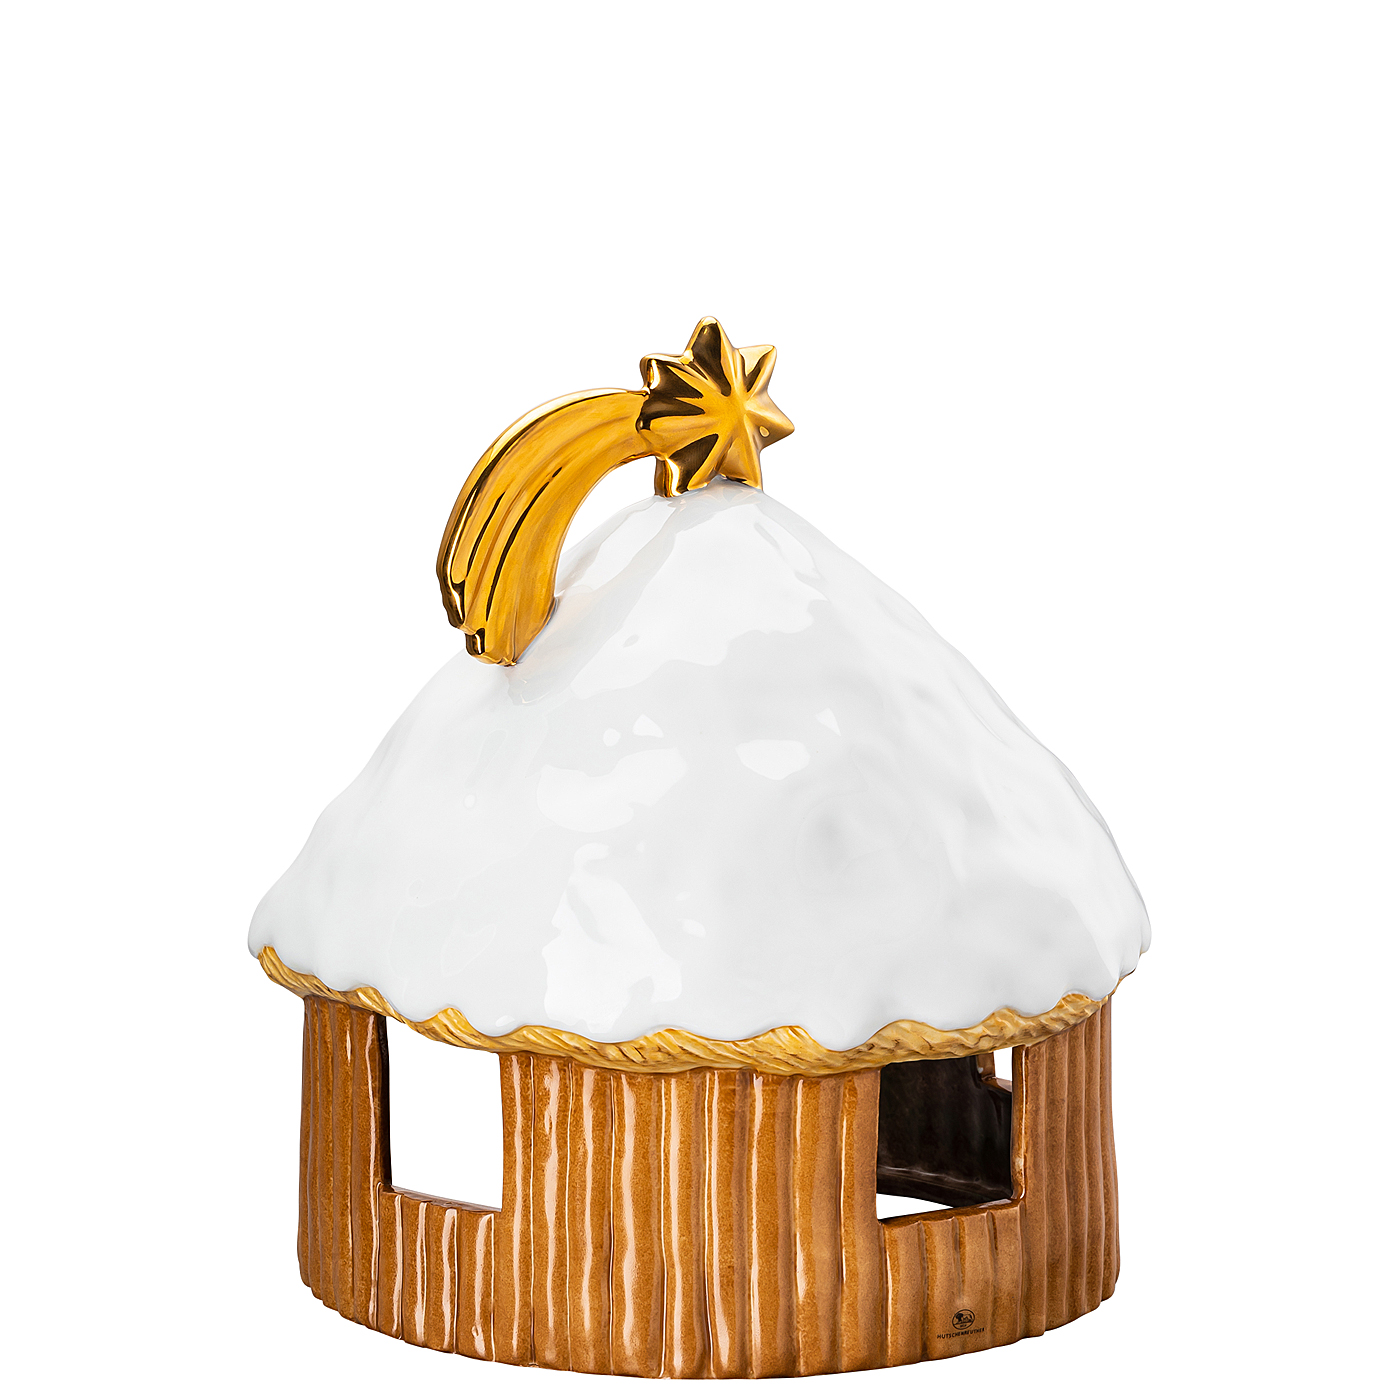 Krippenstall Weihnachtskrippe Krippenfiguren Hutschenreuther